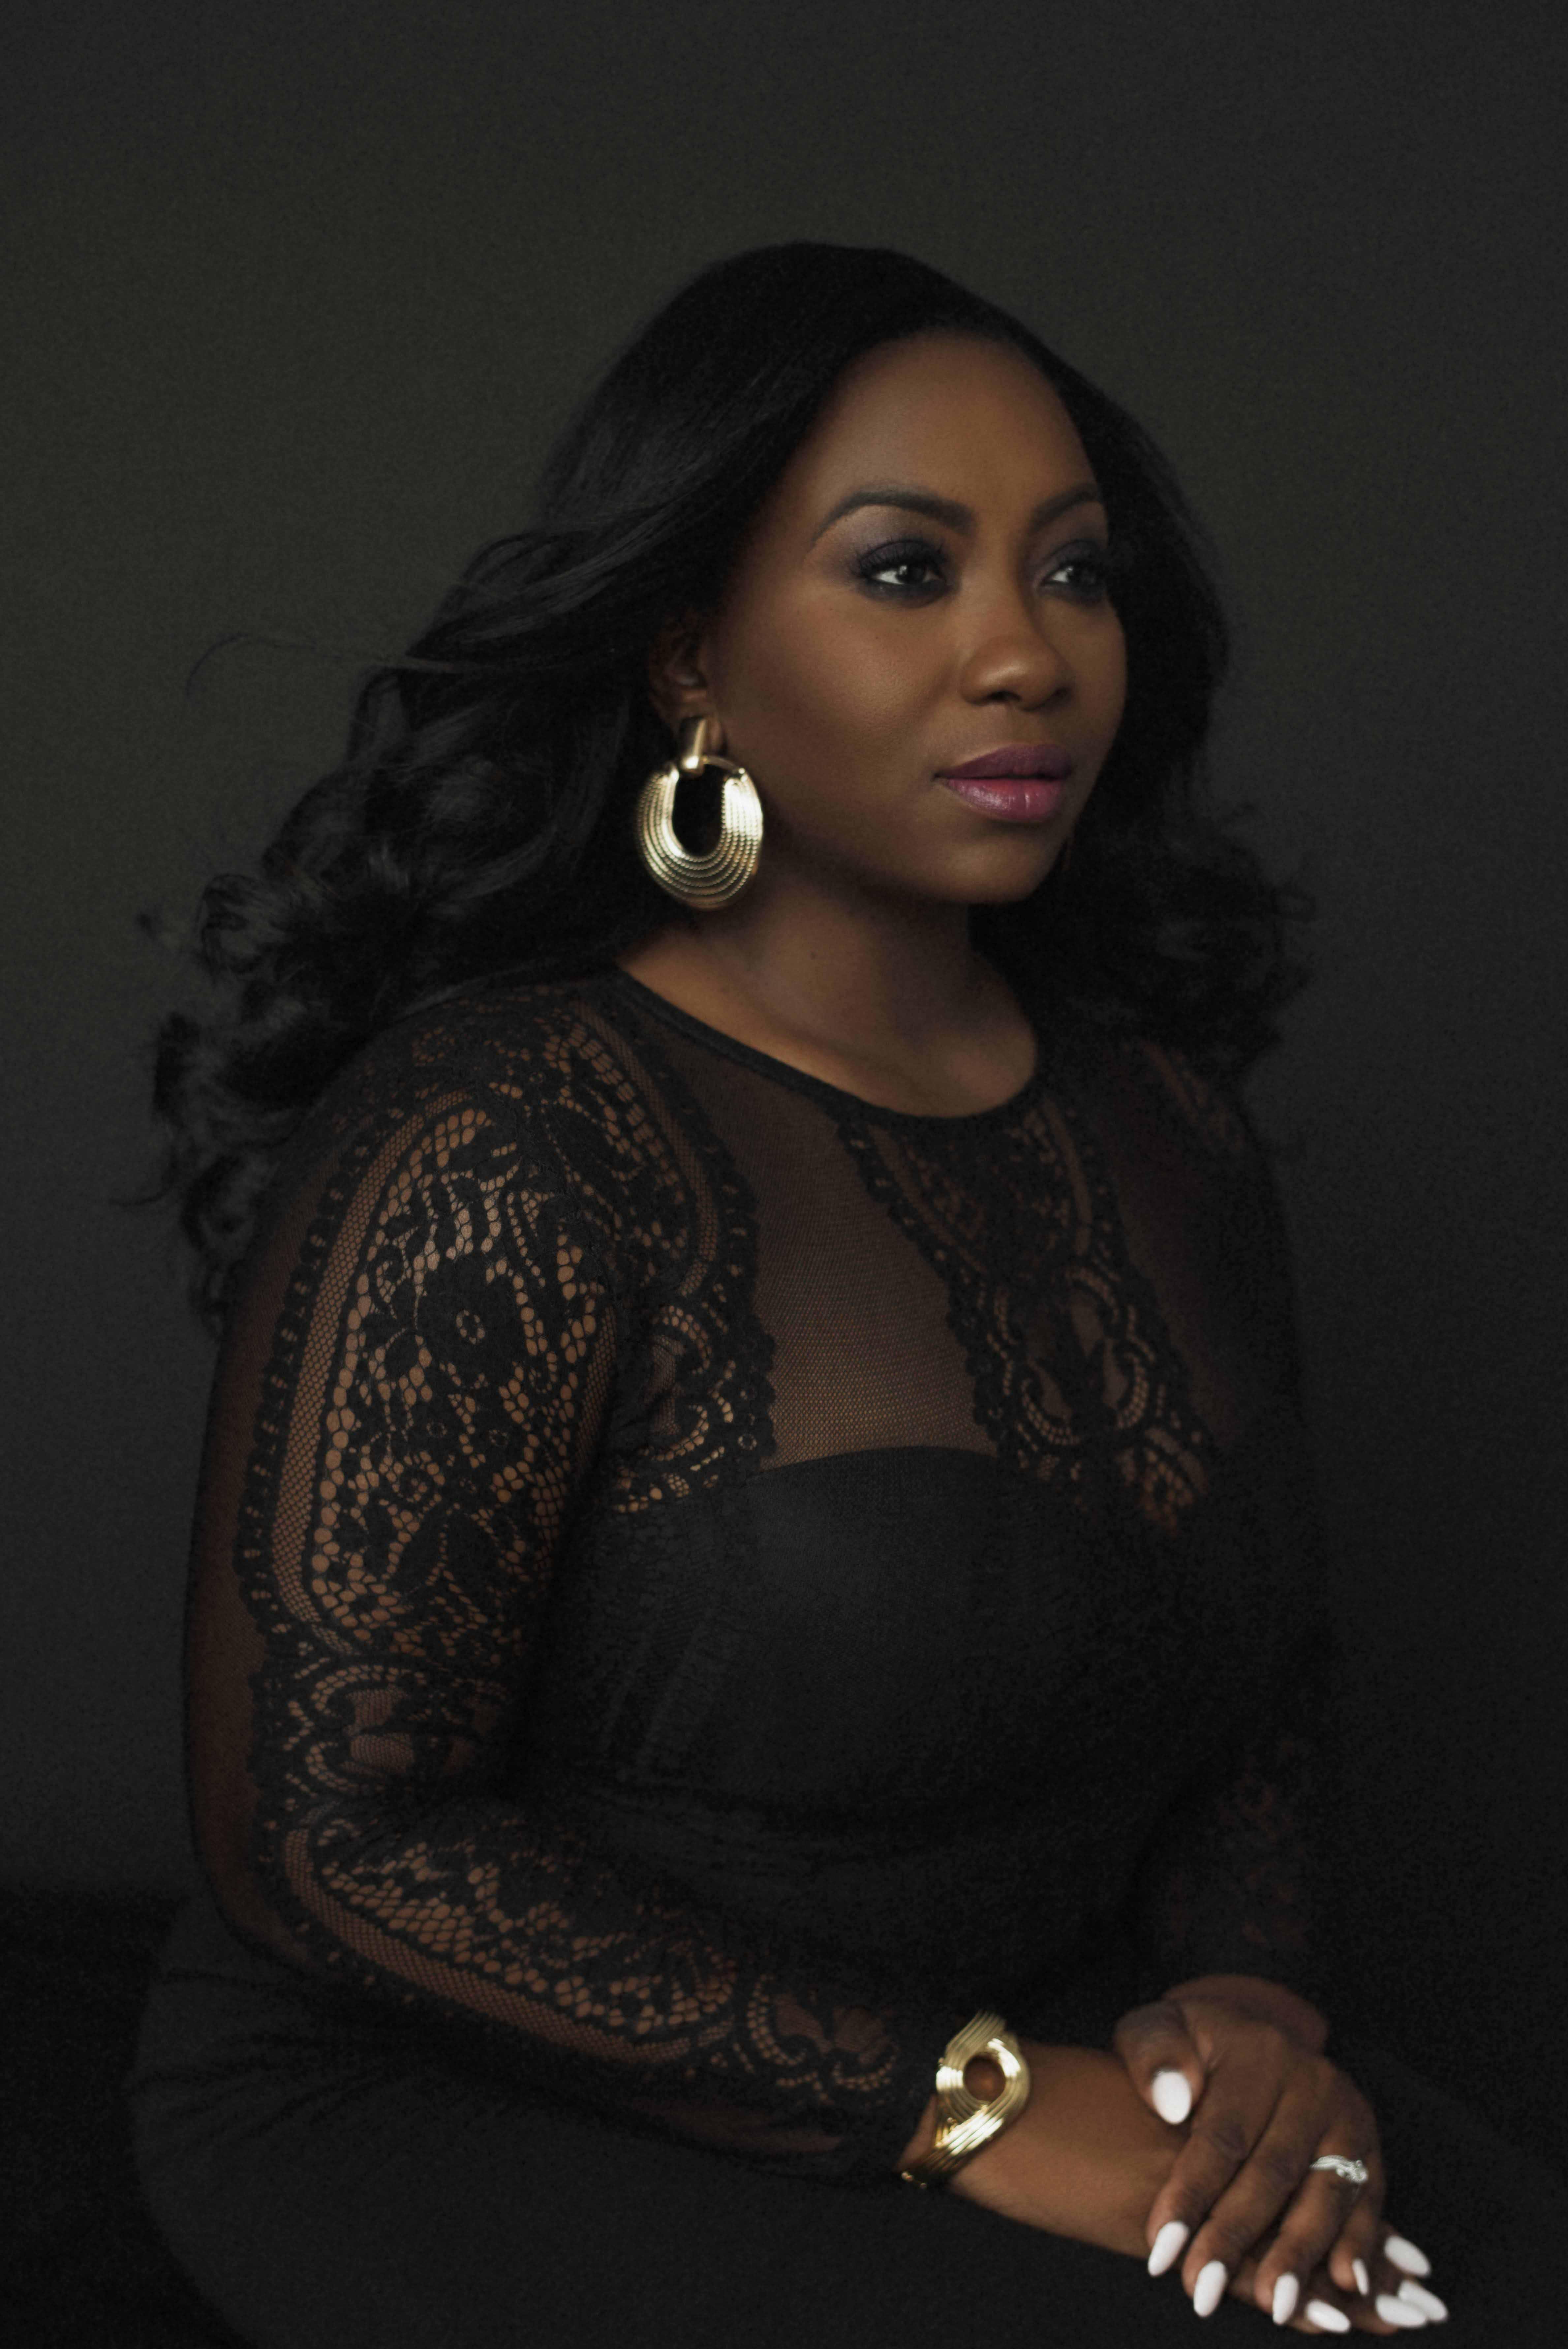 Profile Noire by Rhonisha Franklin